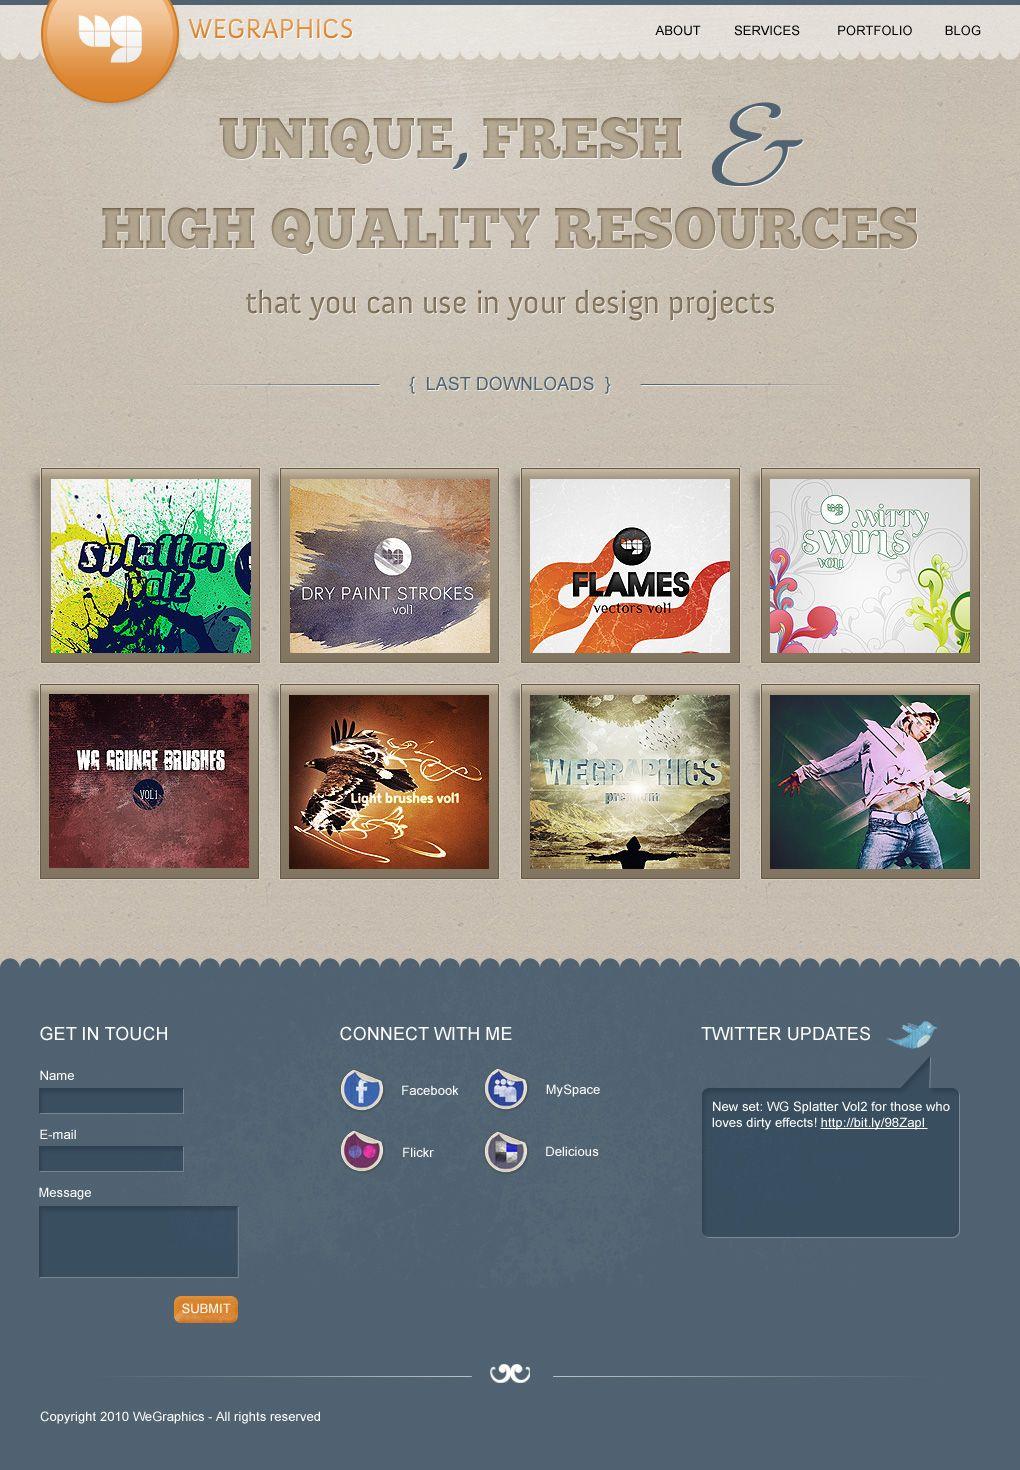 How to create a distinguishable textured web layout in photoshop how to create a distinguishable textured web layout in photoshop baditri Gallery